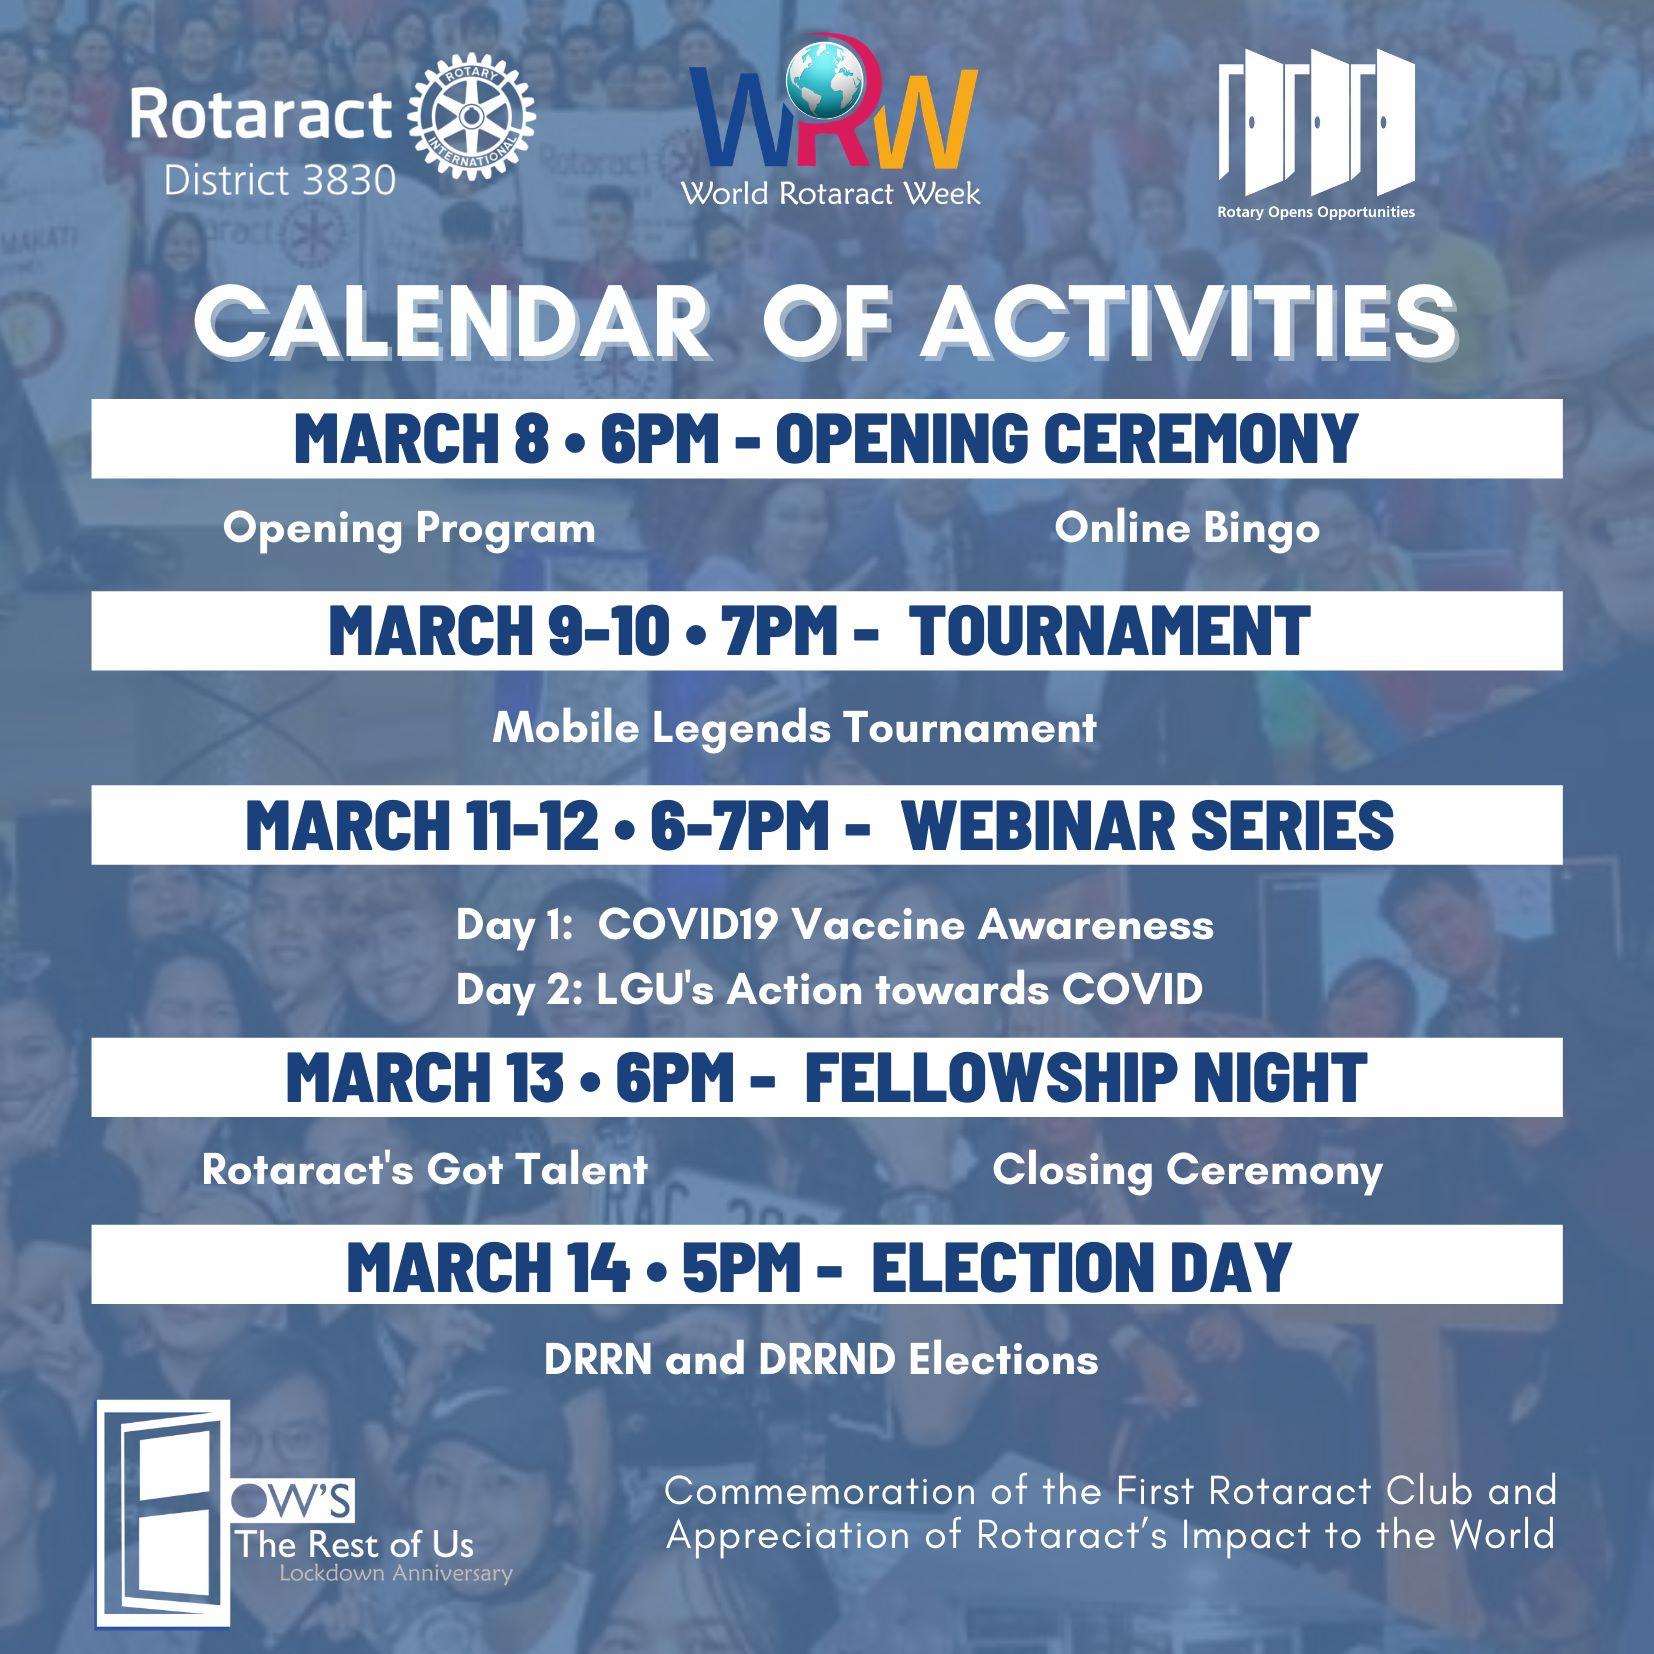 District 3830 World Rotaract Week Fellowship Activities